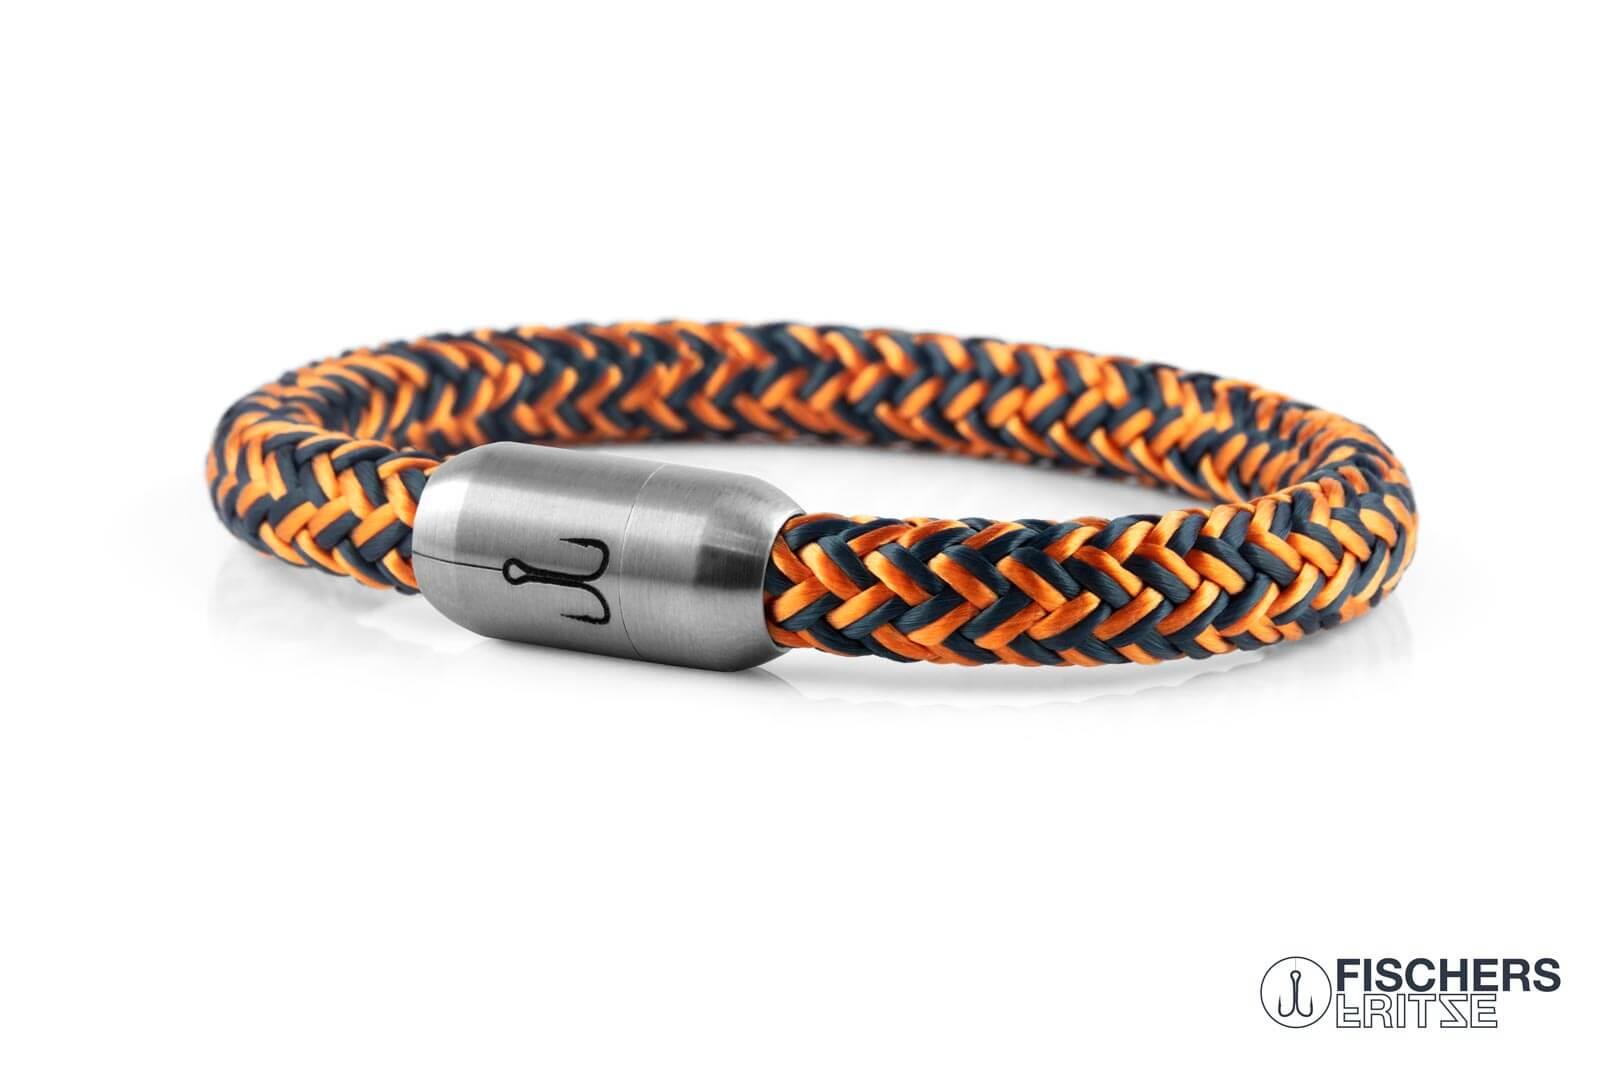 armband-fischers-fritze-makrele-orange-petrol-segeltau